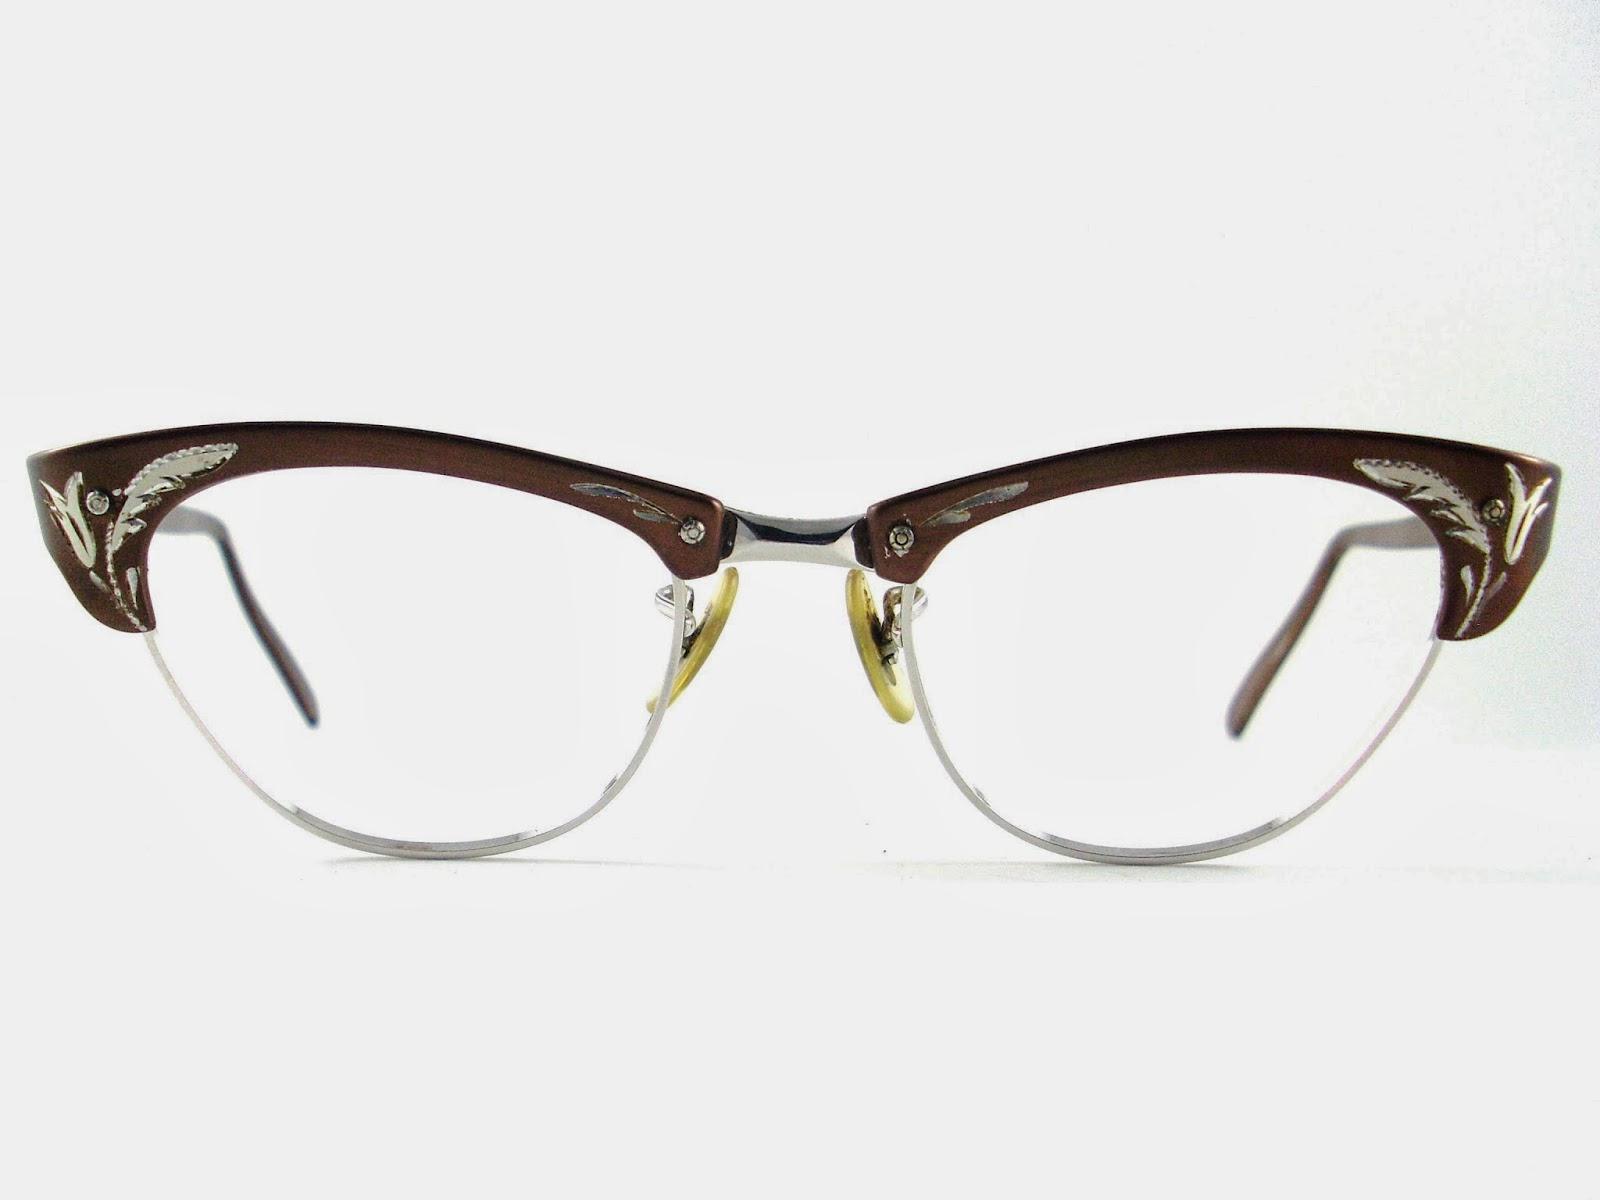 Eyeglass Frames Used : Vintage Eyeglasses Frames Eyewear Sunglasses 50S: Vintage ...